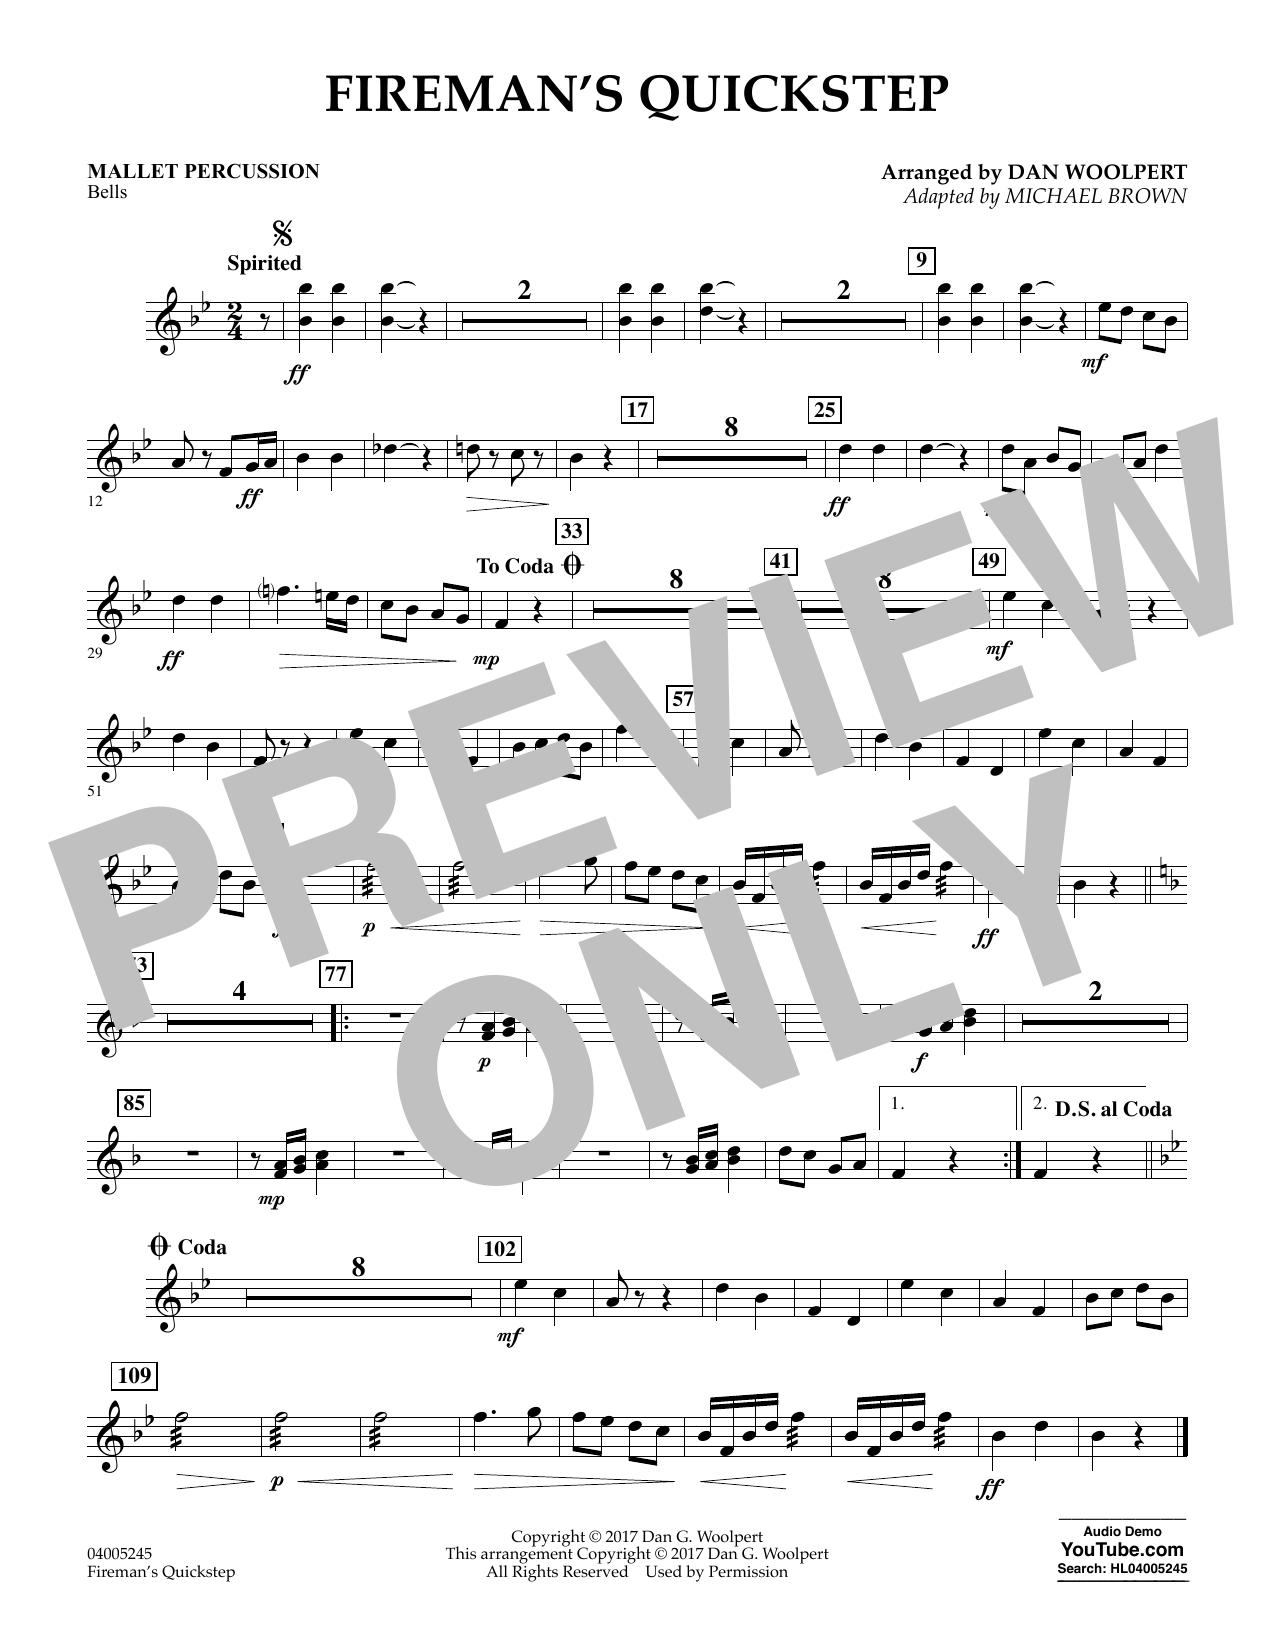 Fireman's Quickstep - Mallet Percussion (Concert Band)